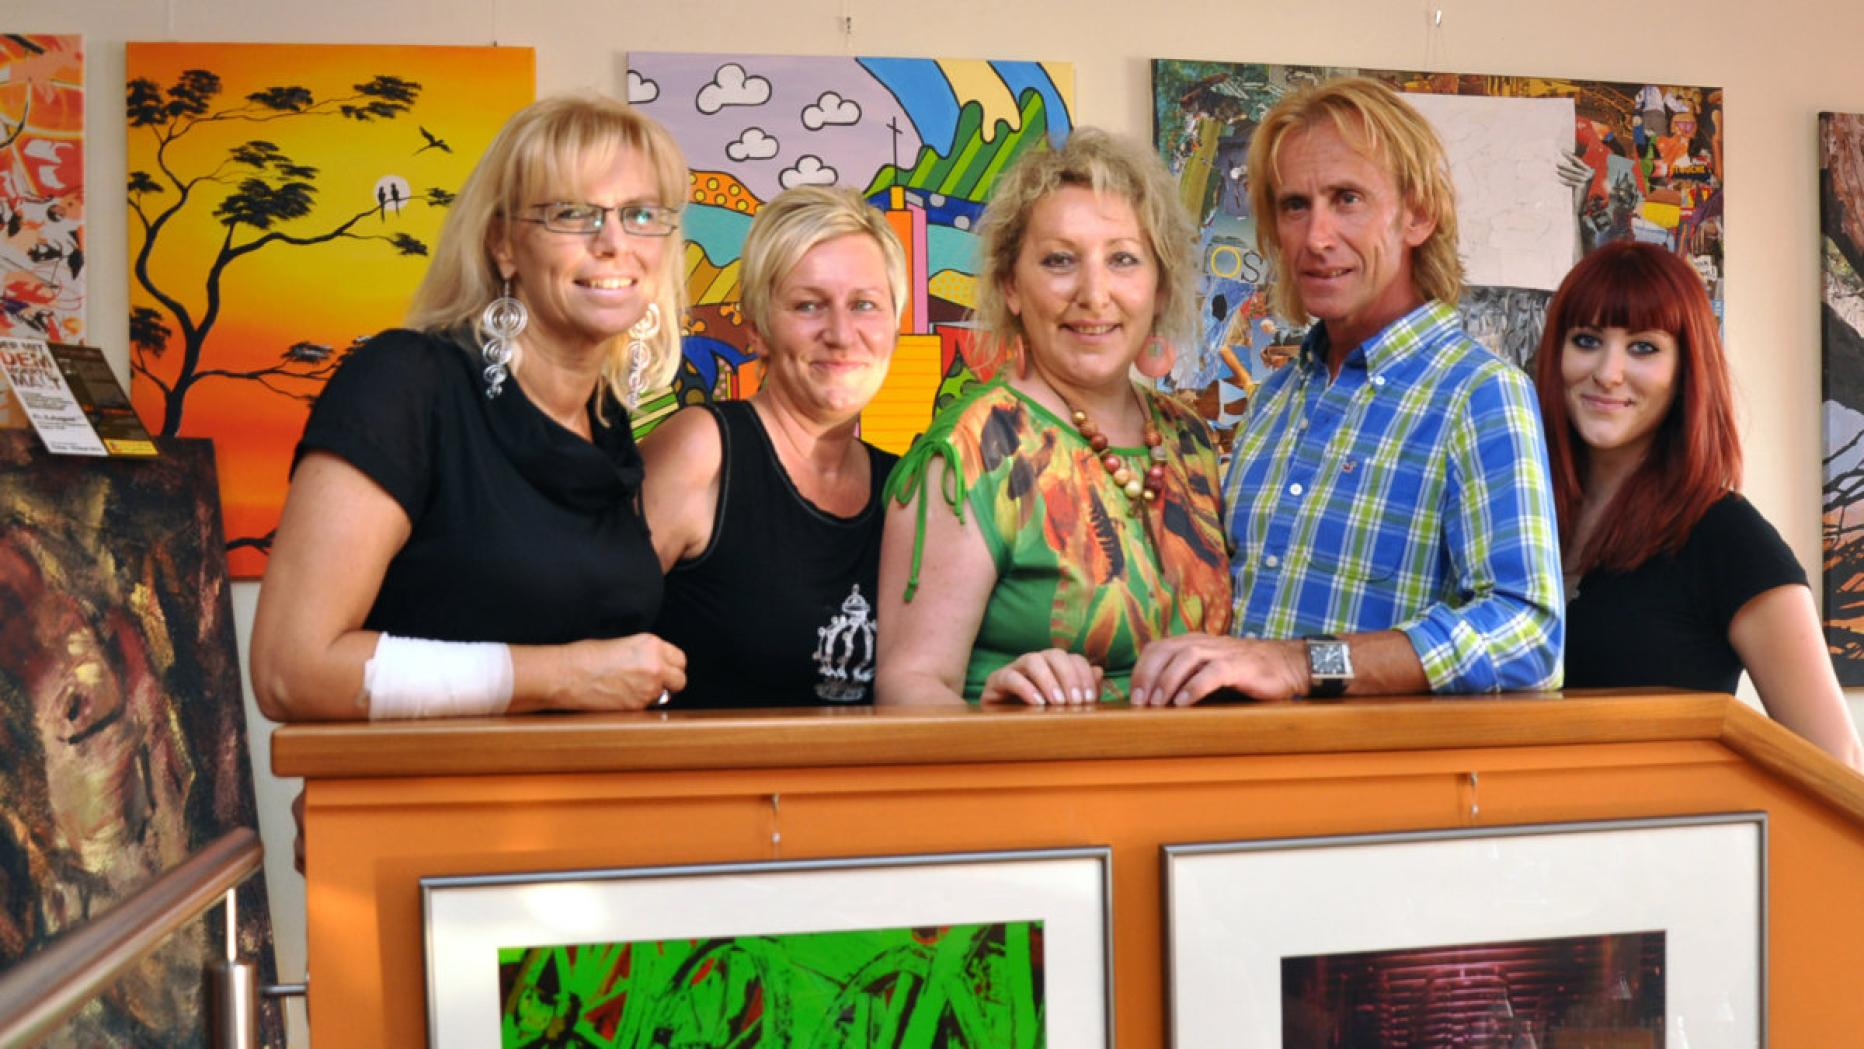 Bekanntschaften in Stegersbach - Partnersuche & Kontakte